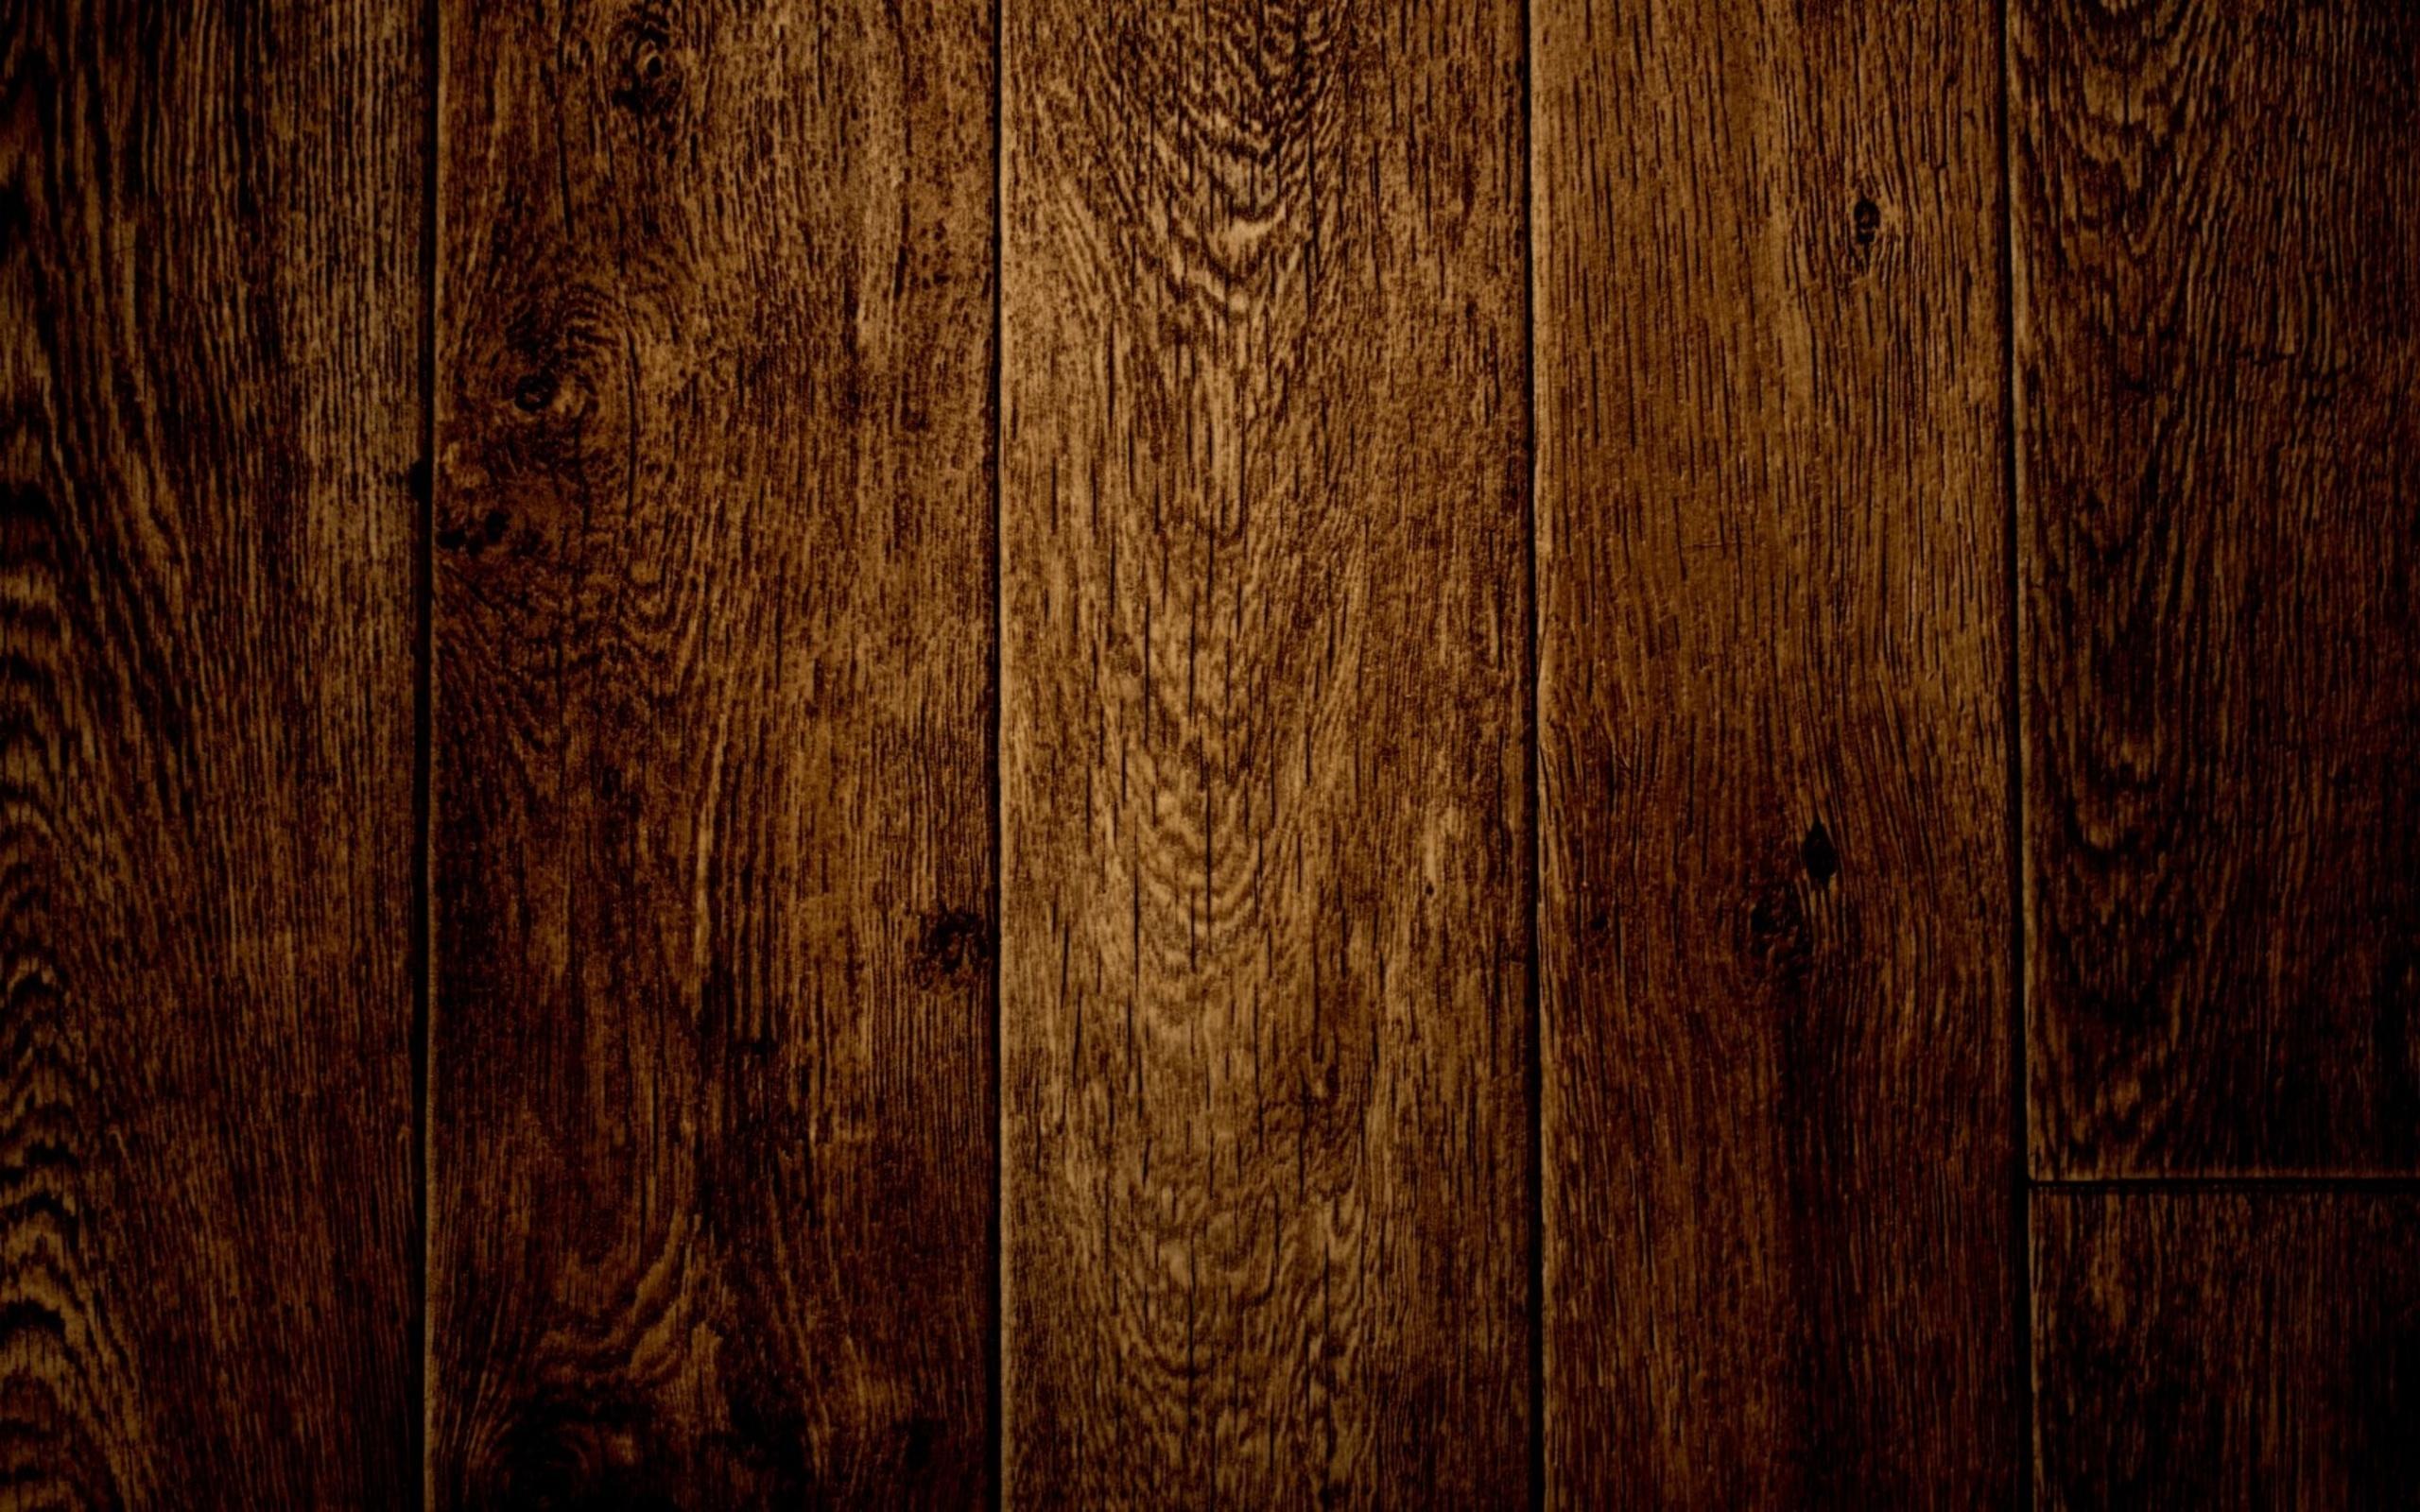 47 Woodworking Desktop Wallpaper On Wallpapersafari